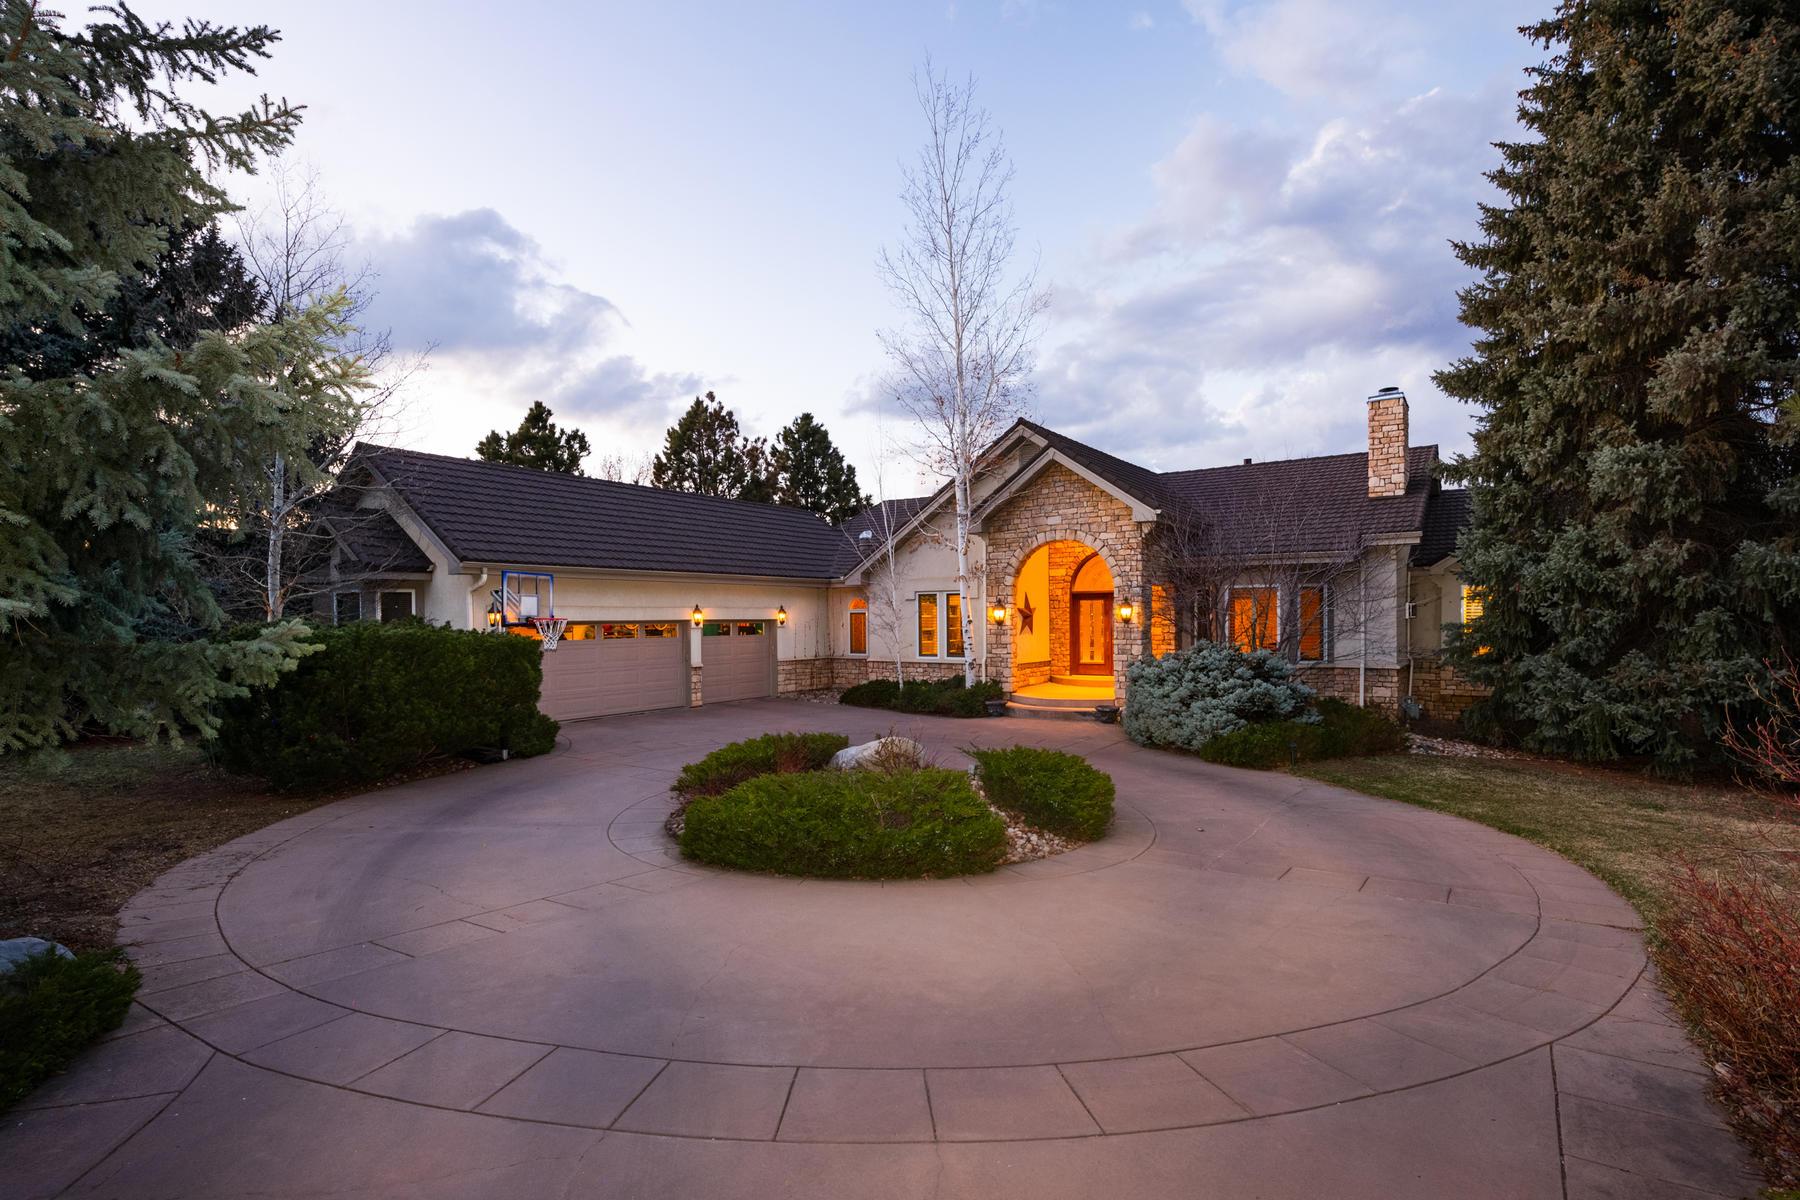 Single Family Homes のために 売買 アット Rare & Unique Opportunity in Greenwood HIlls! 5757 E Ida Circle, Greenwood Village, コロラド 80111 アメリカ